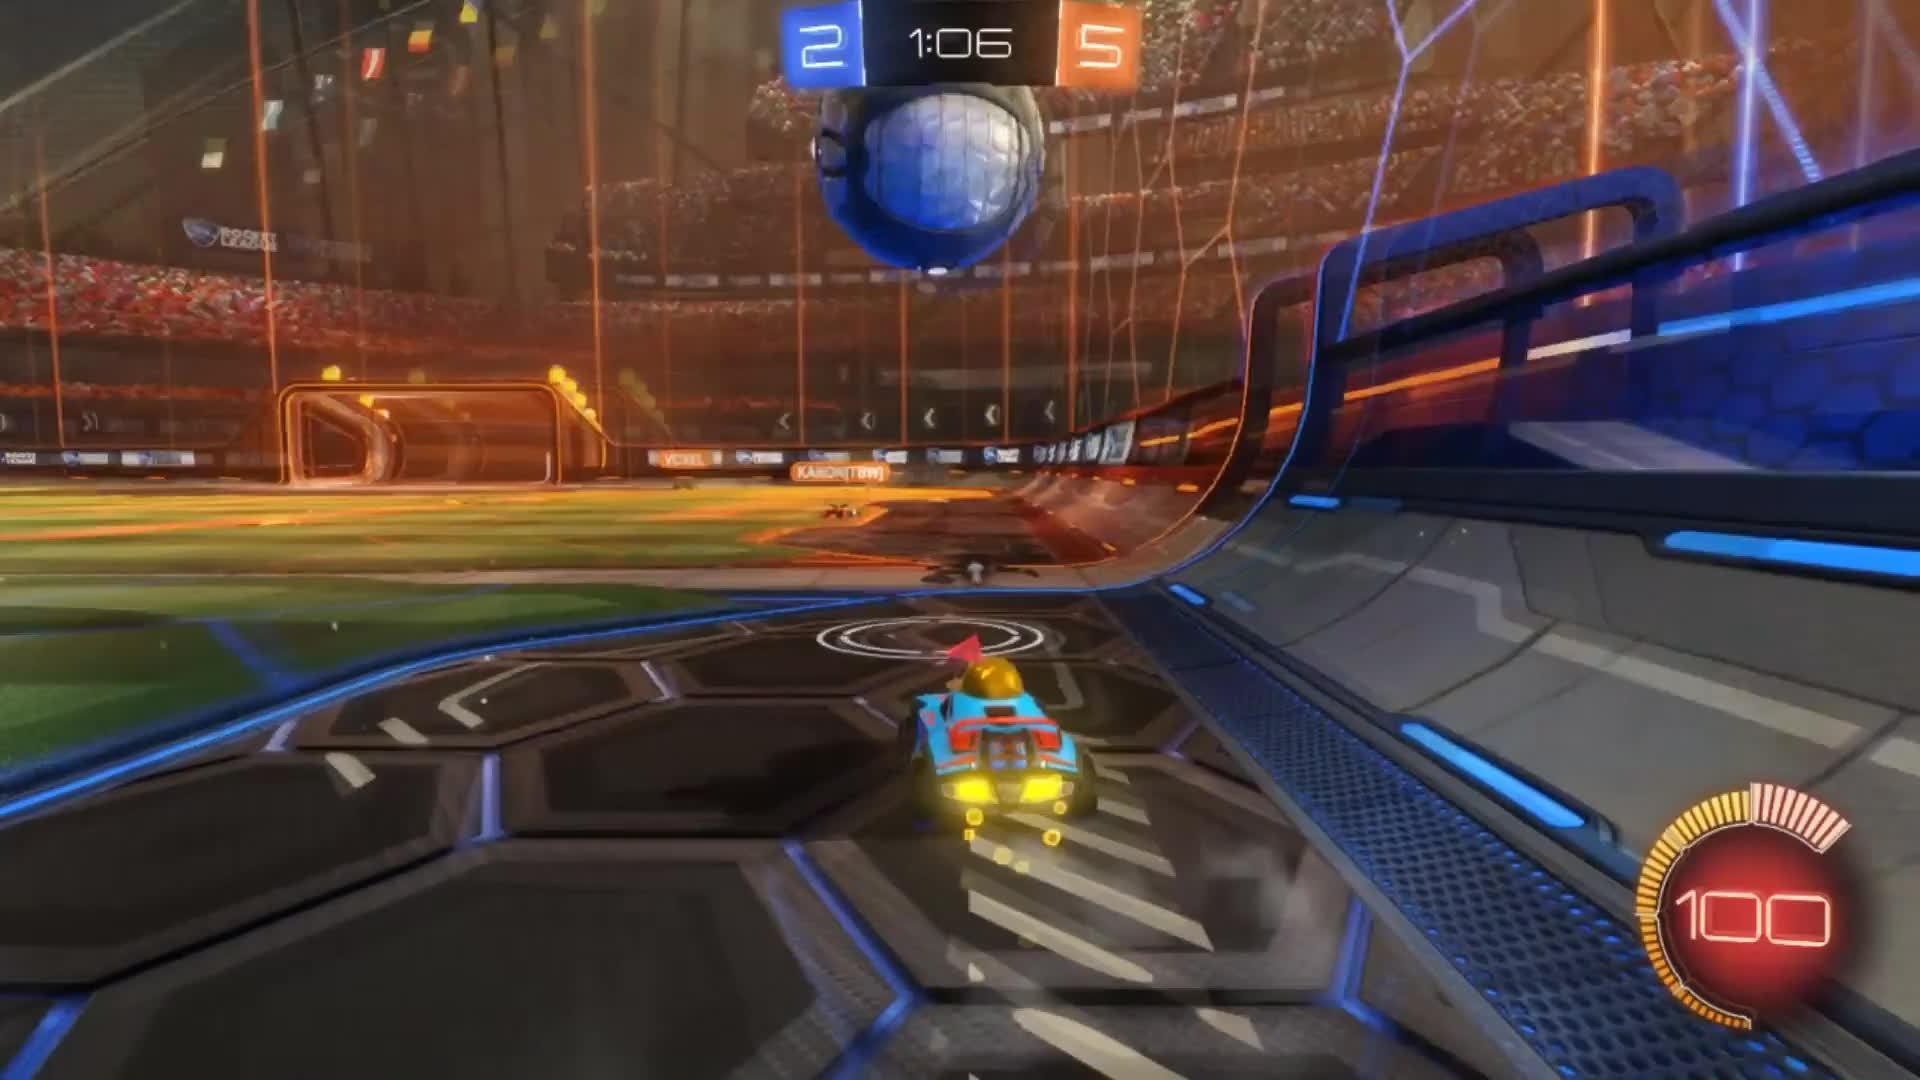 RocketLeagueSchool, rocketleague, A few basics for lower level players [gifs] (reddit) GIFs